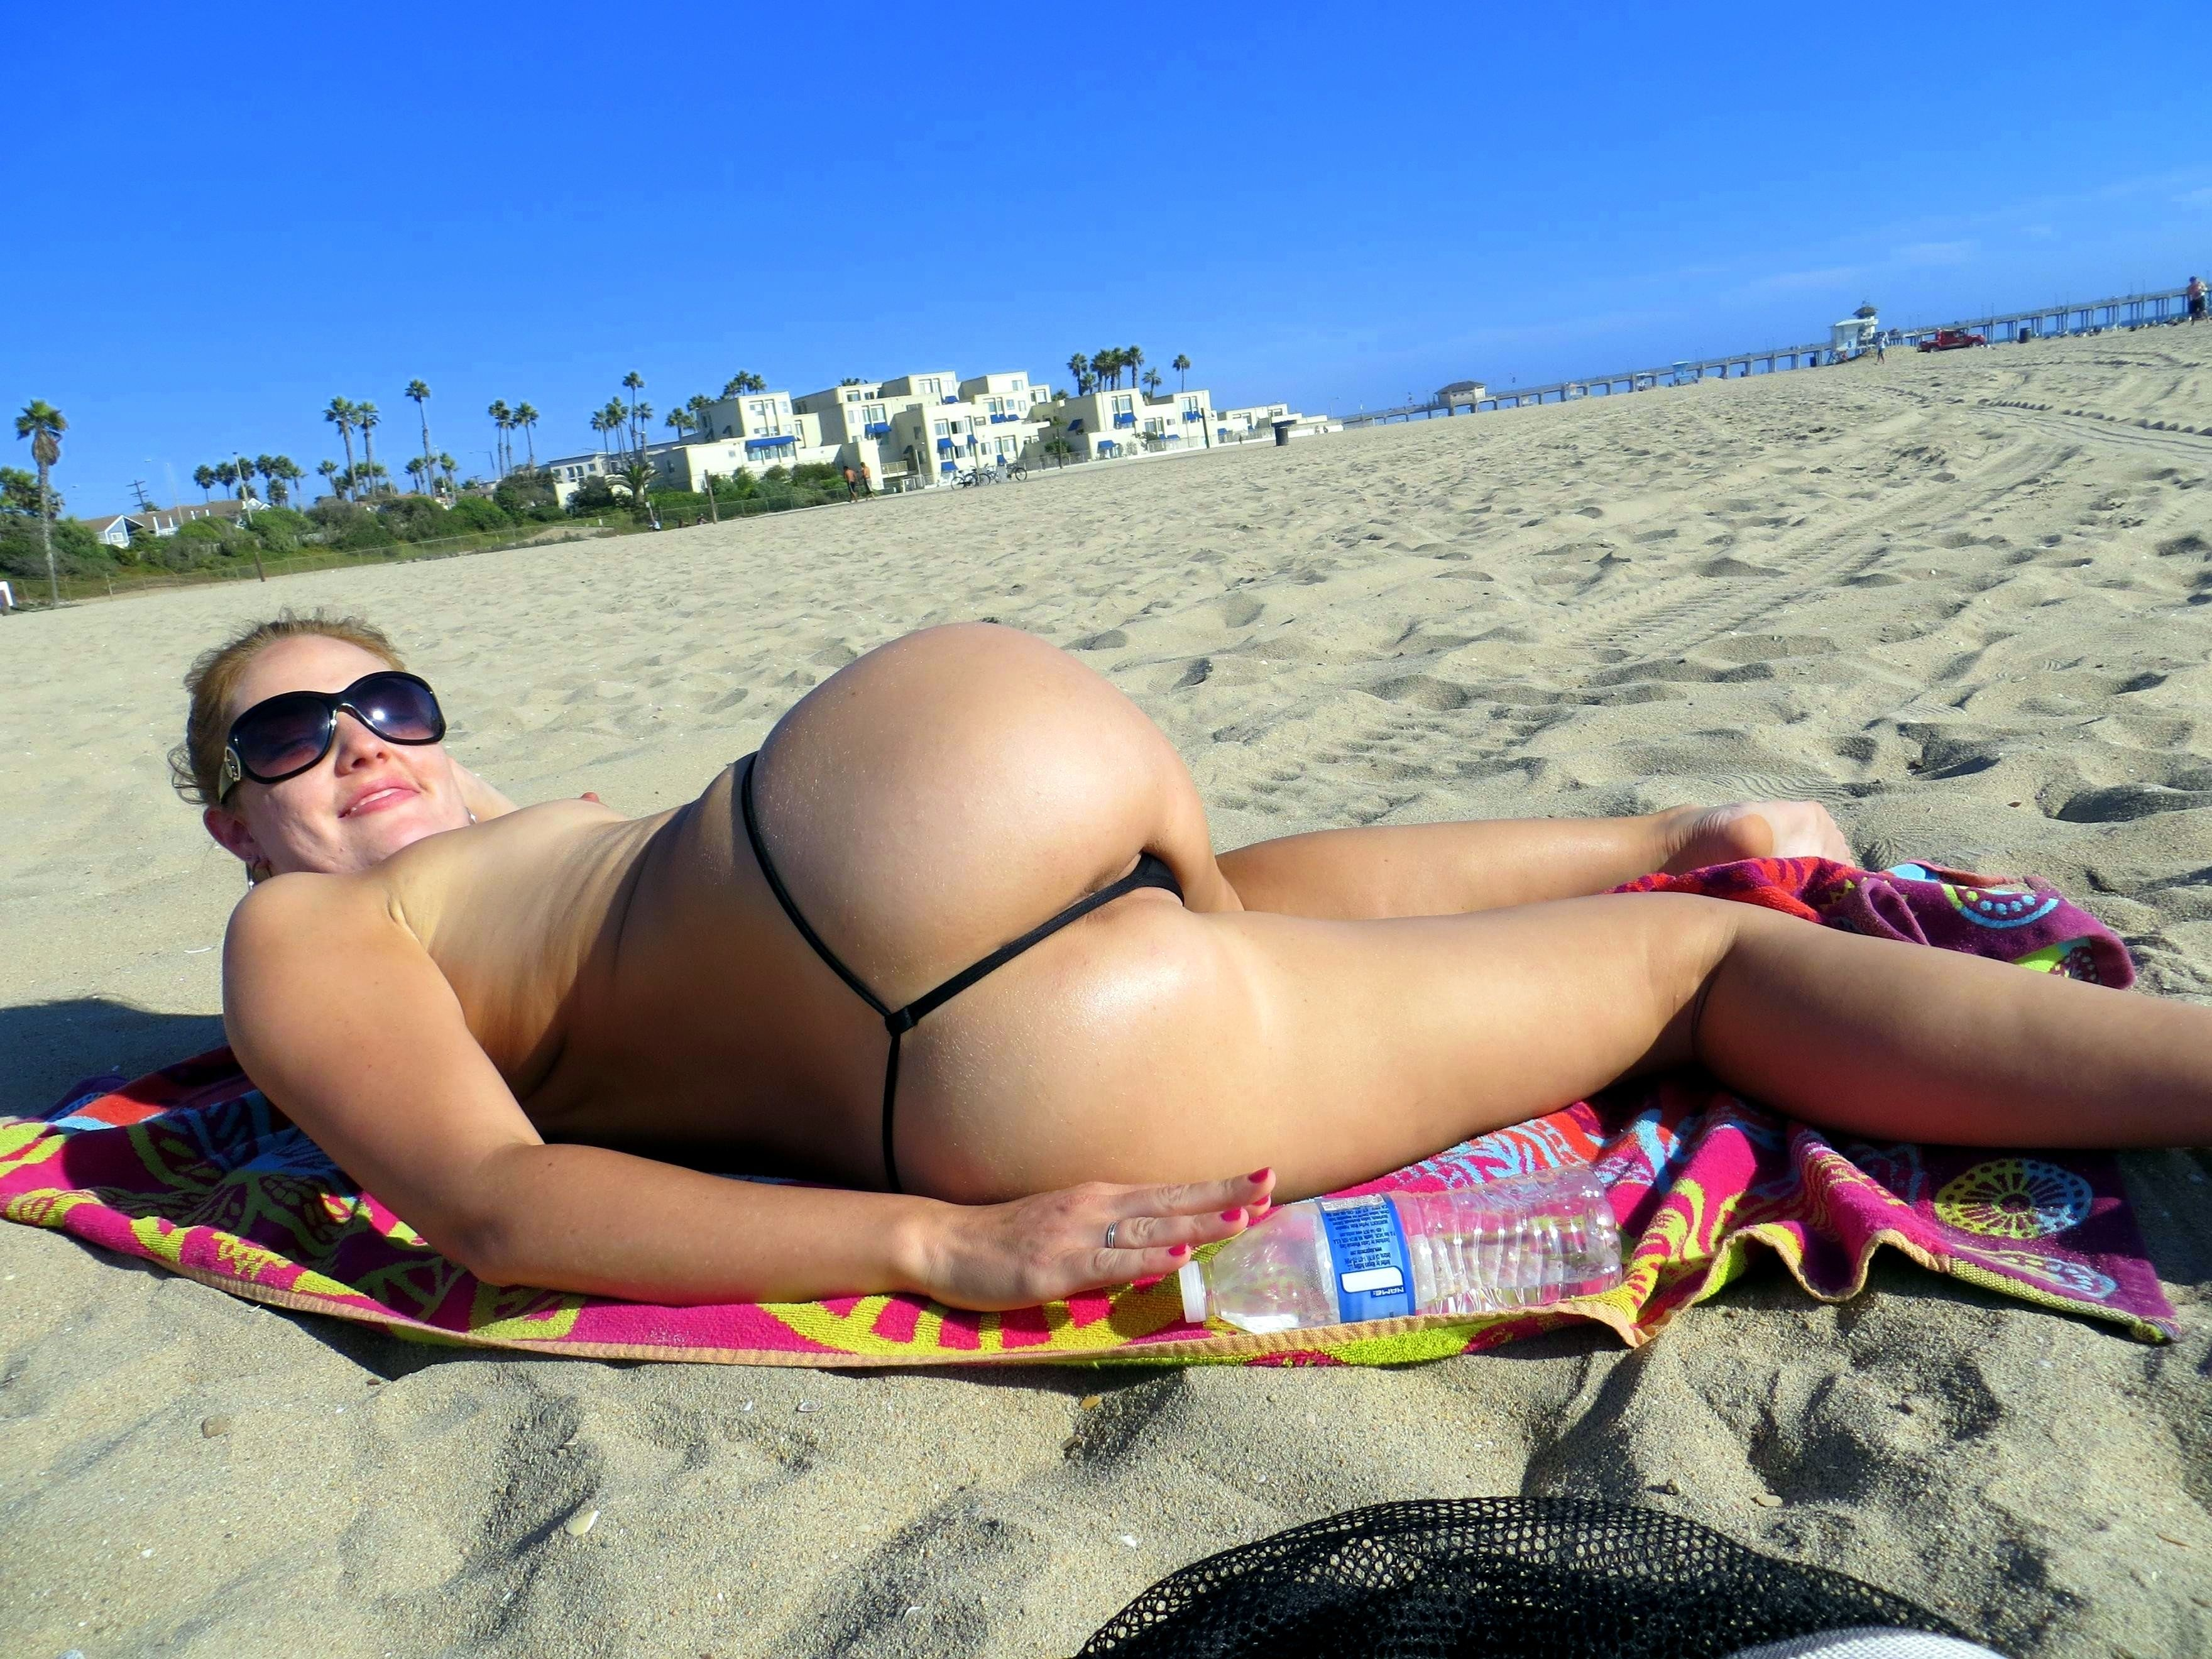 zasvechennie-popki-na-plyazhe-v-bikini-foto-lyuba